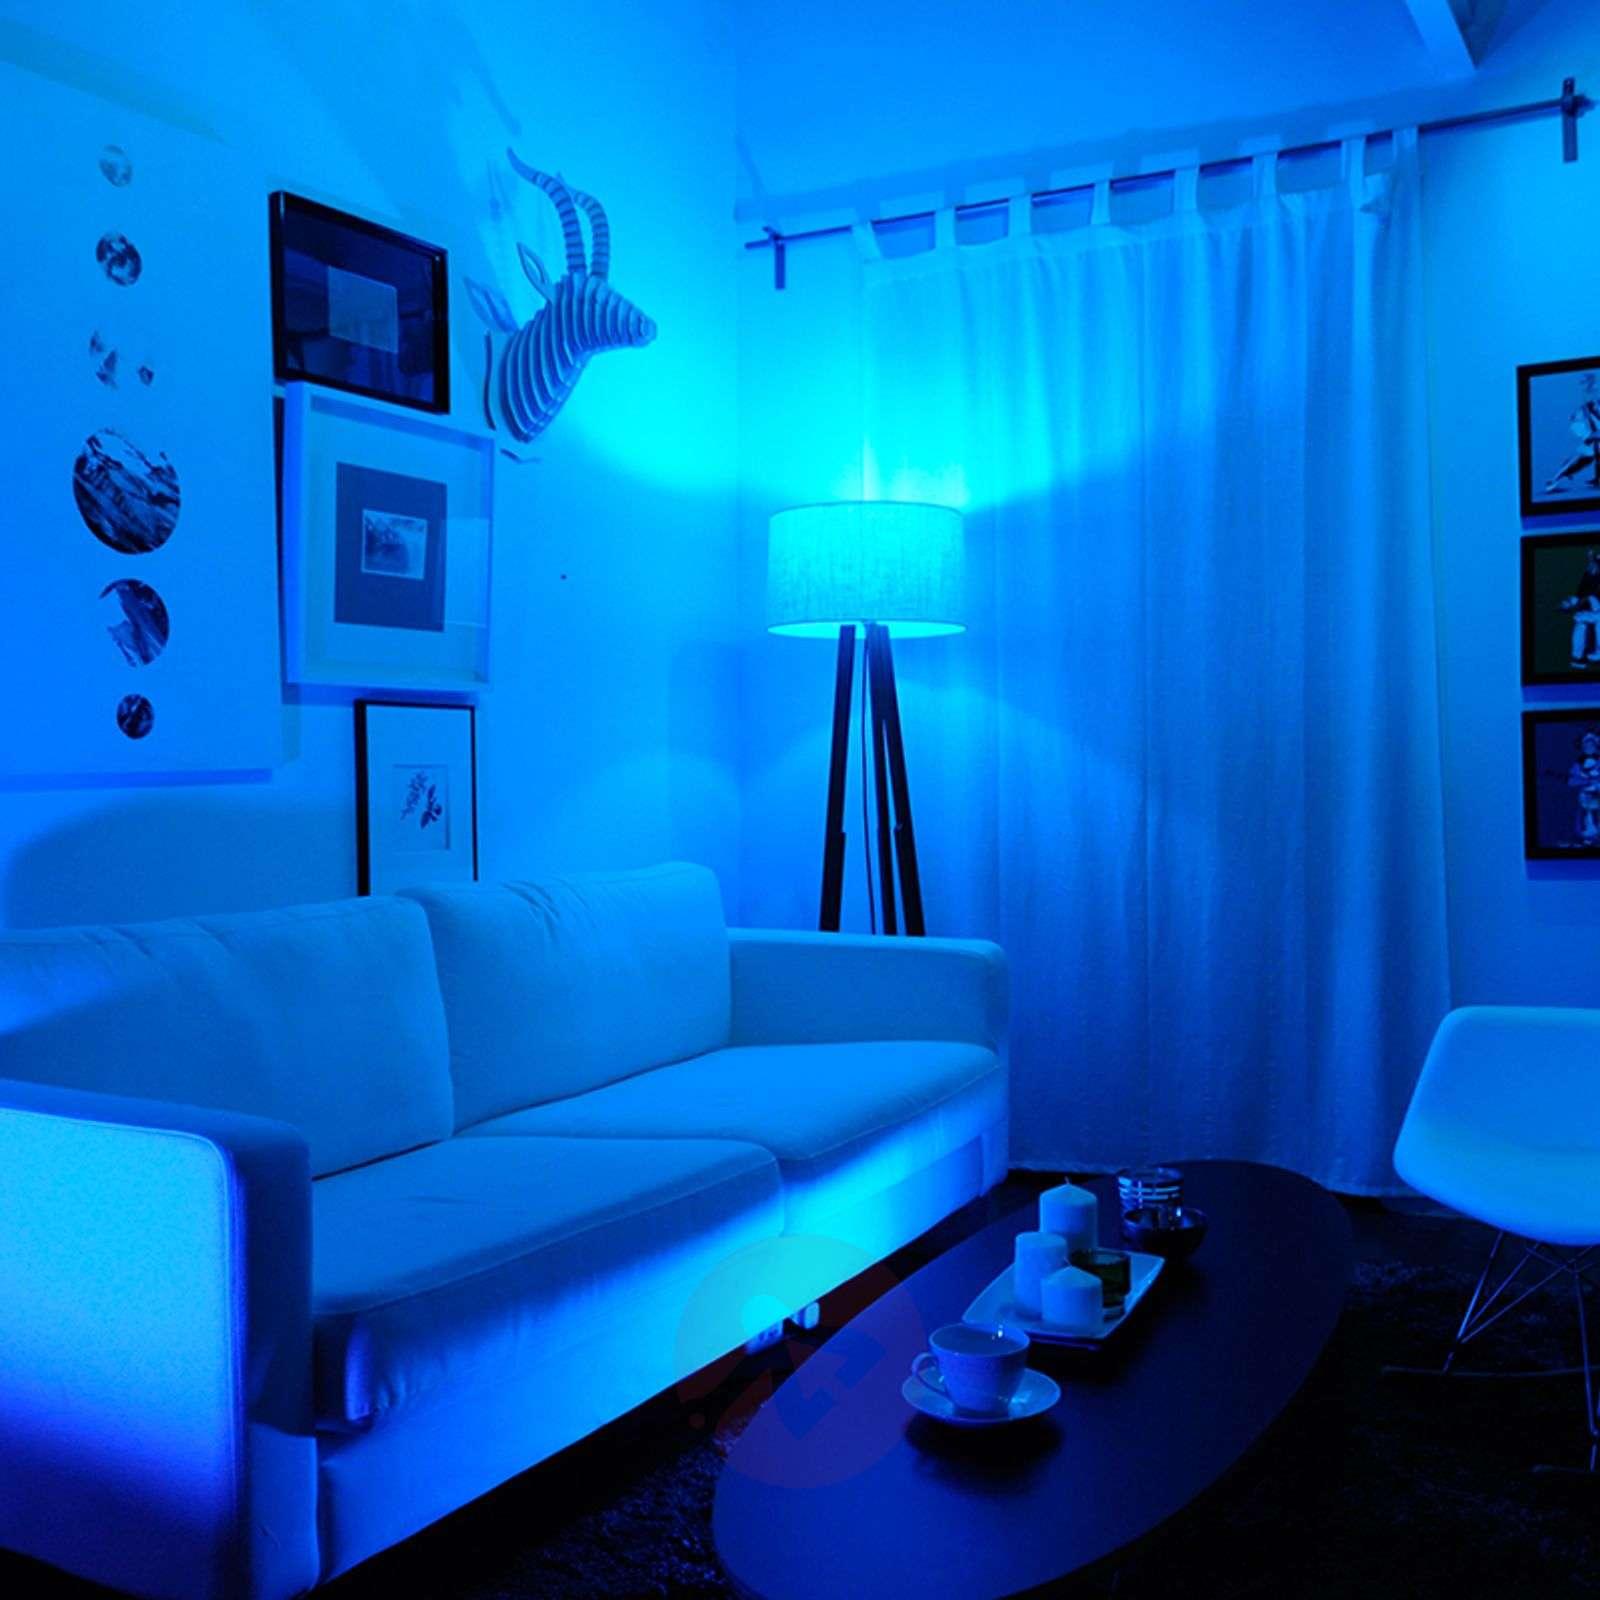 E14 iDual LED lamp 7W RGB without remote-9038021-01